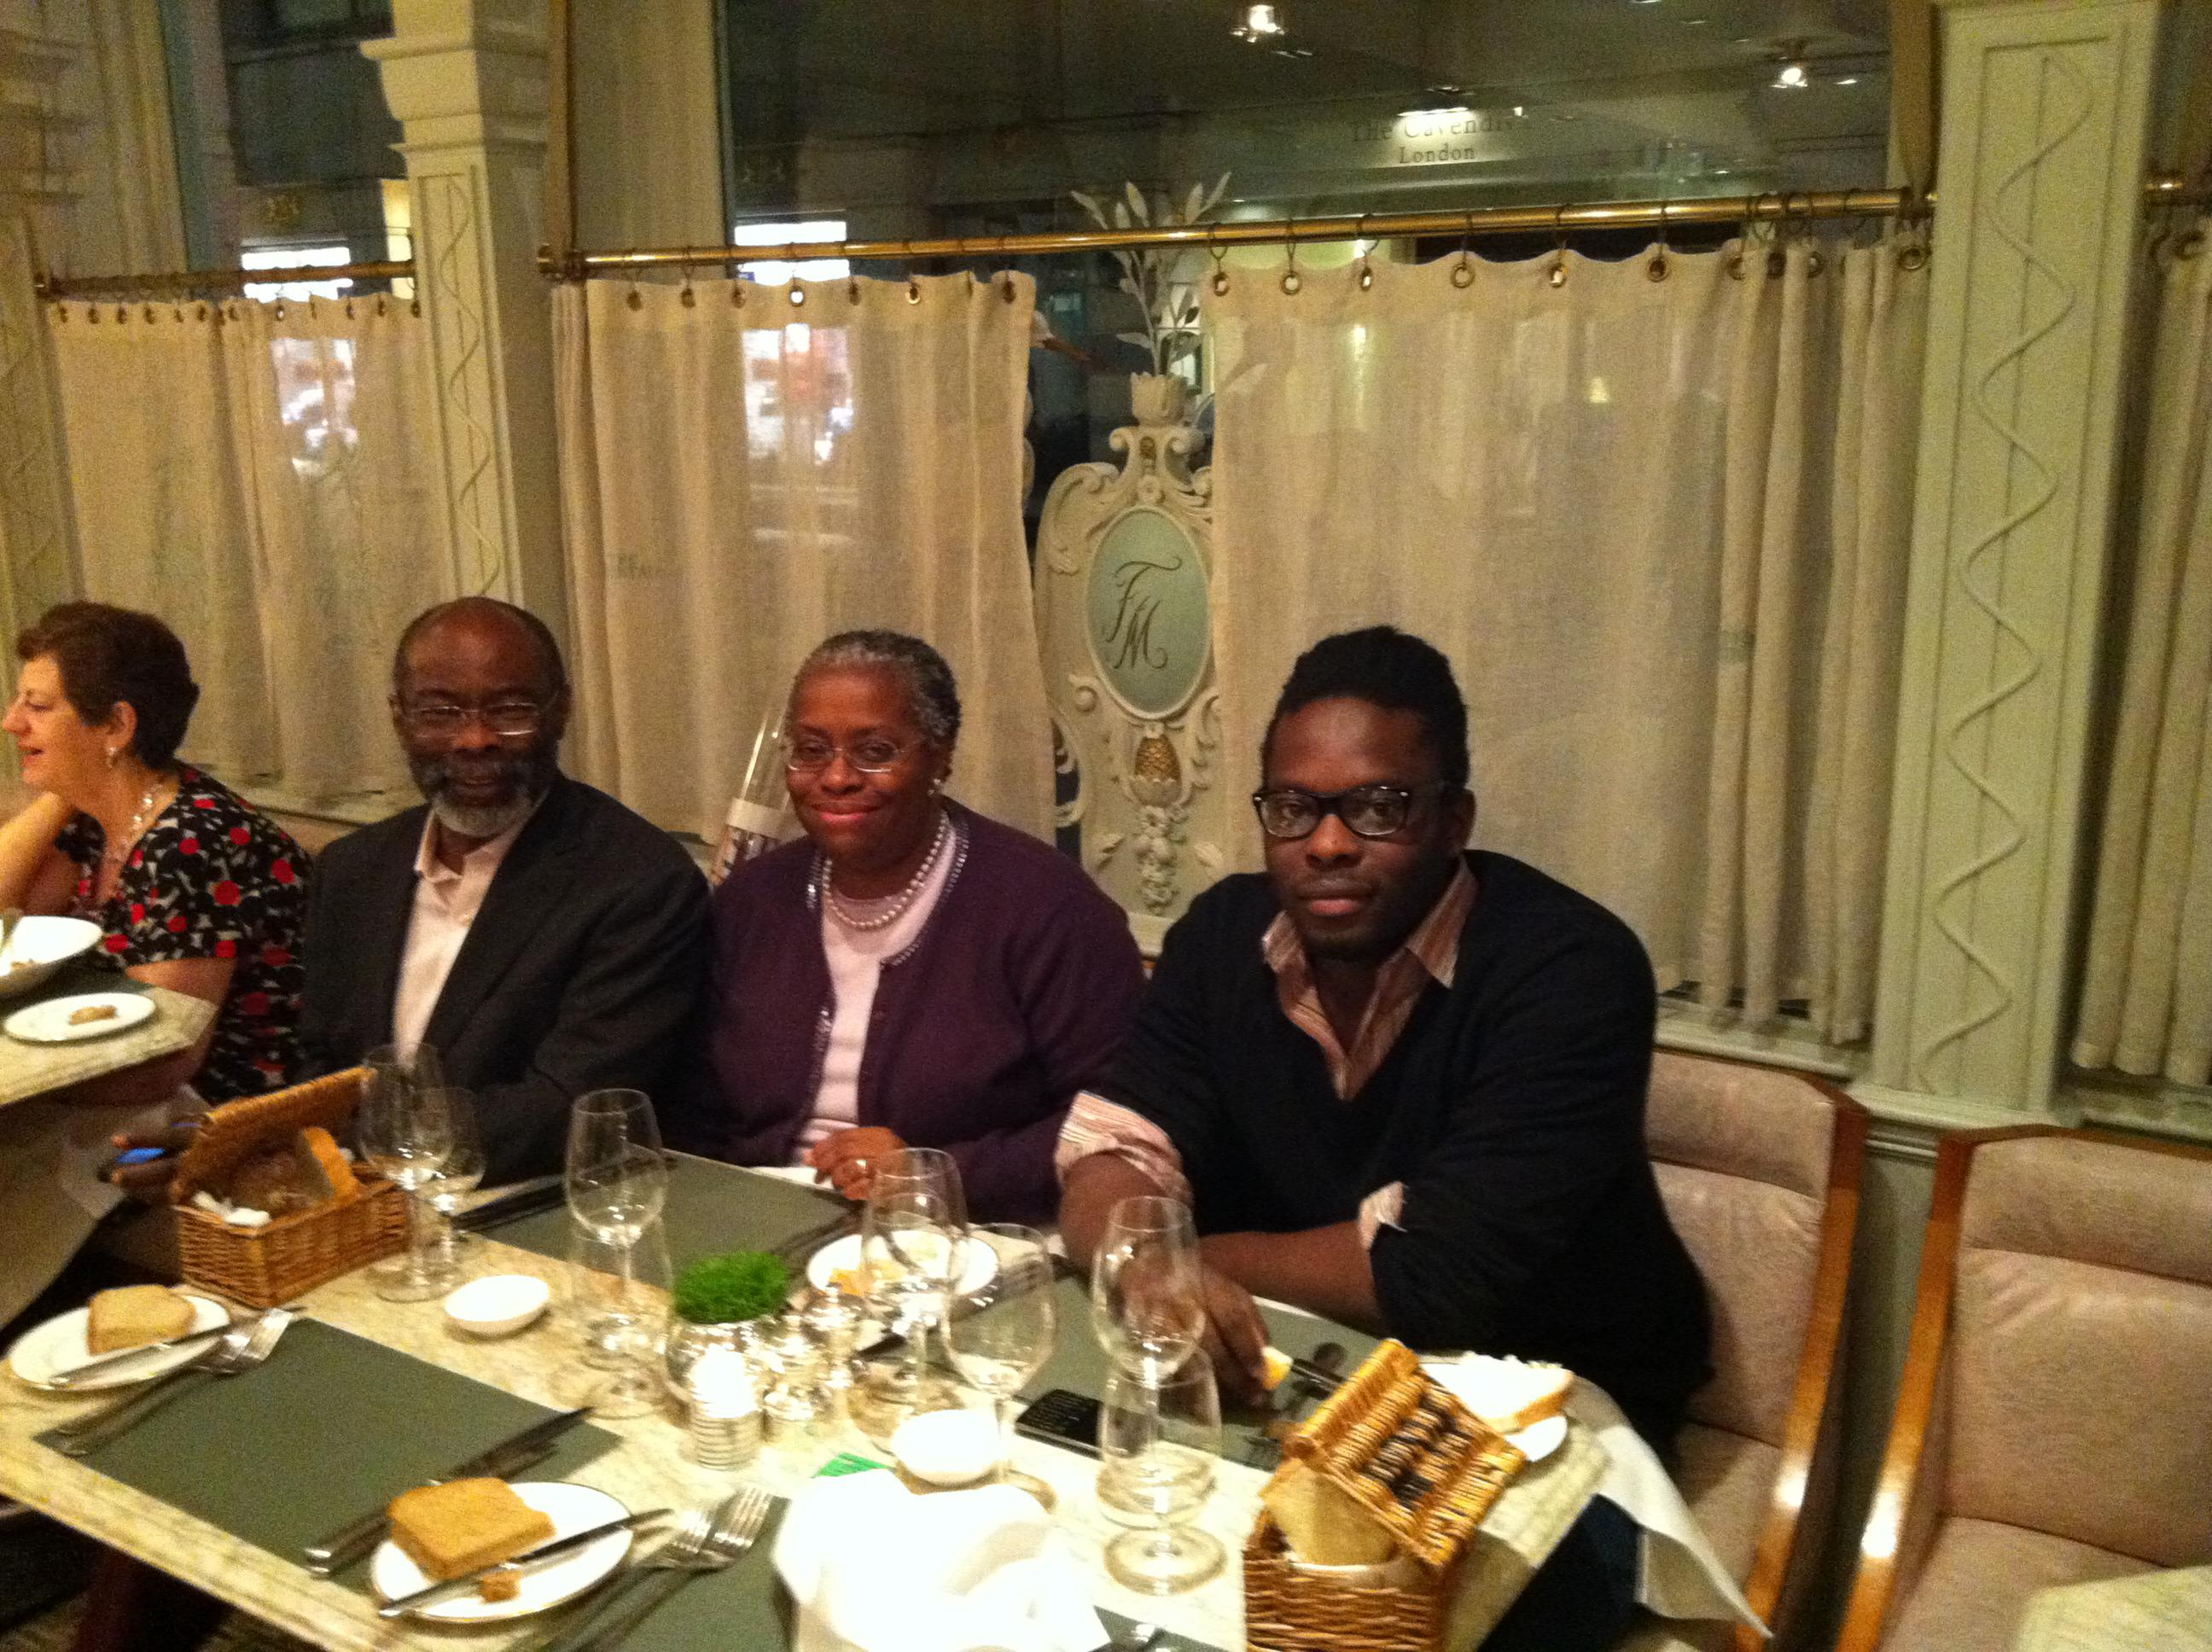 Ron and Rodney;  and Tunji, Buki, and Rodney